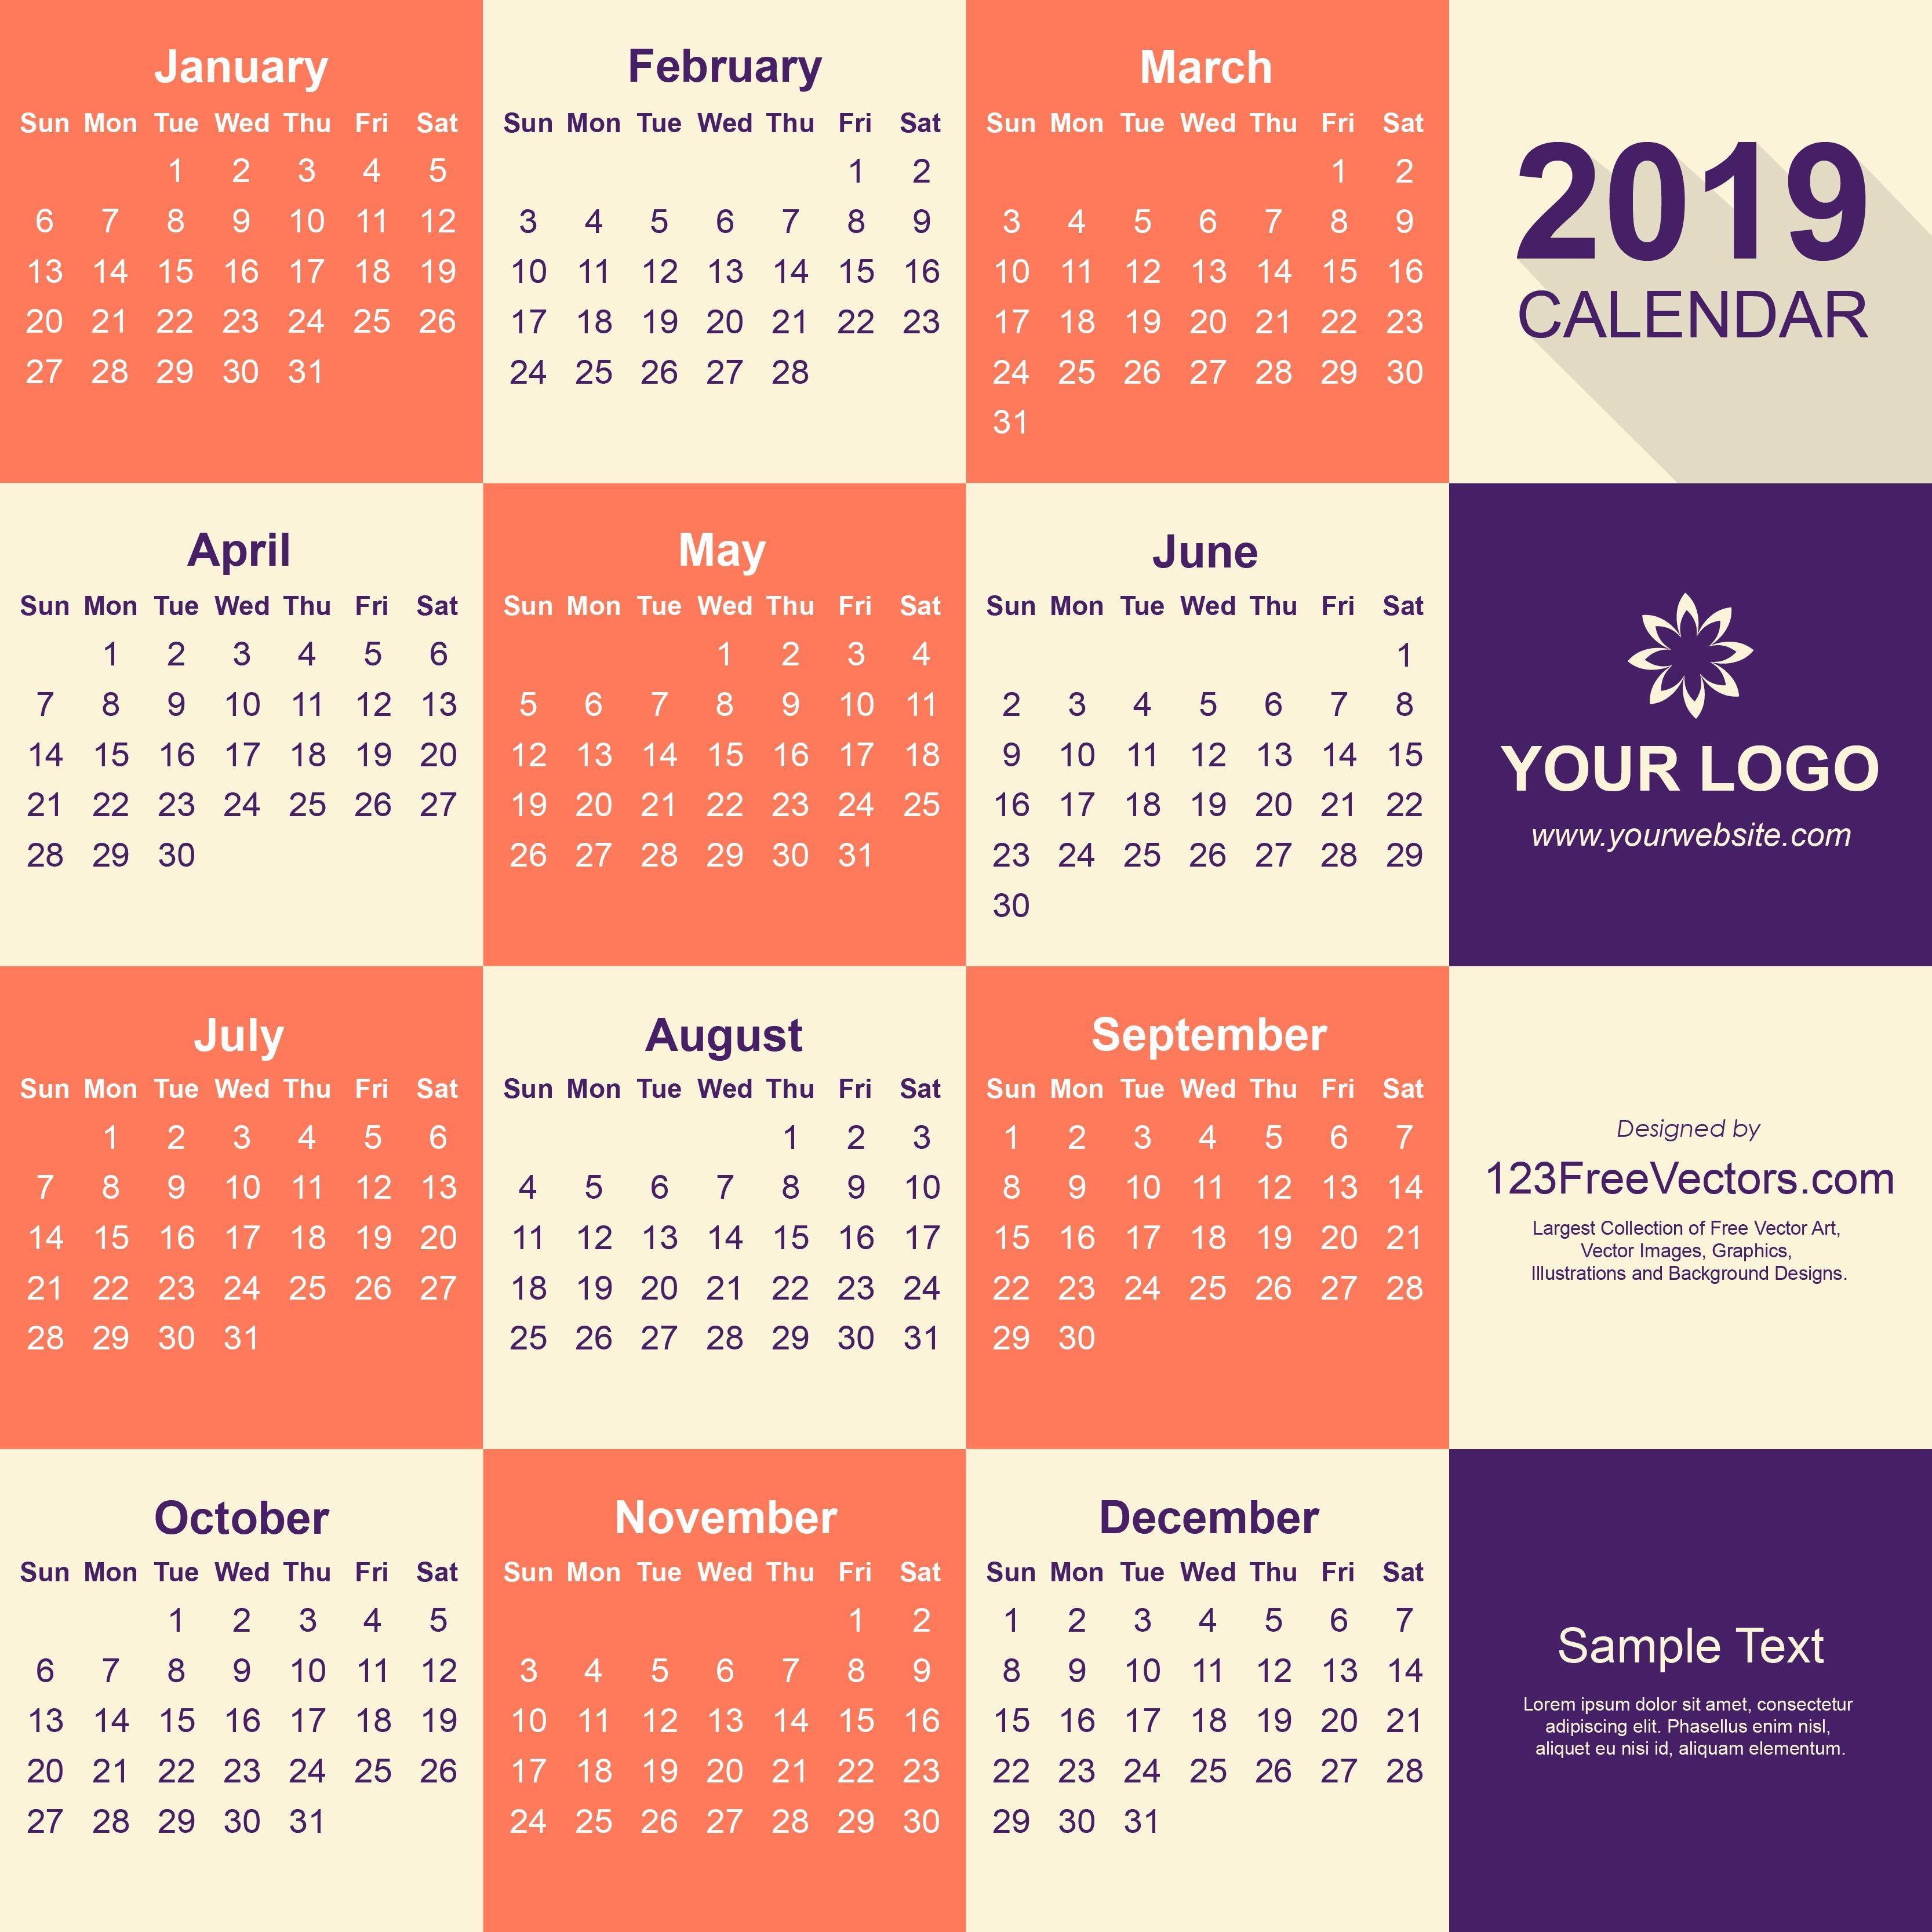 2019 Calendar Pdf Free Download Calendar 2019 Pdf Free Download